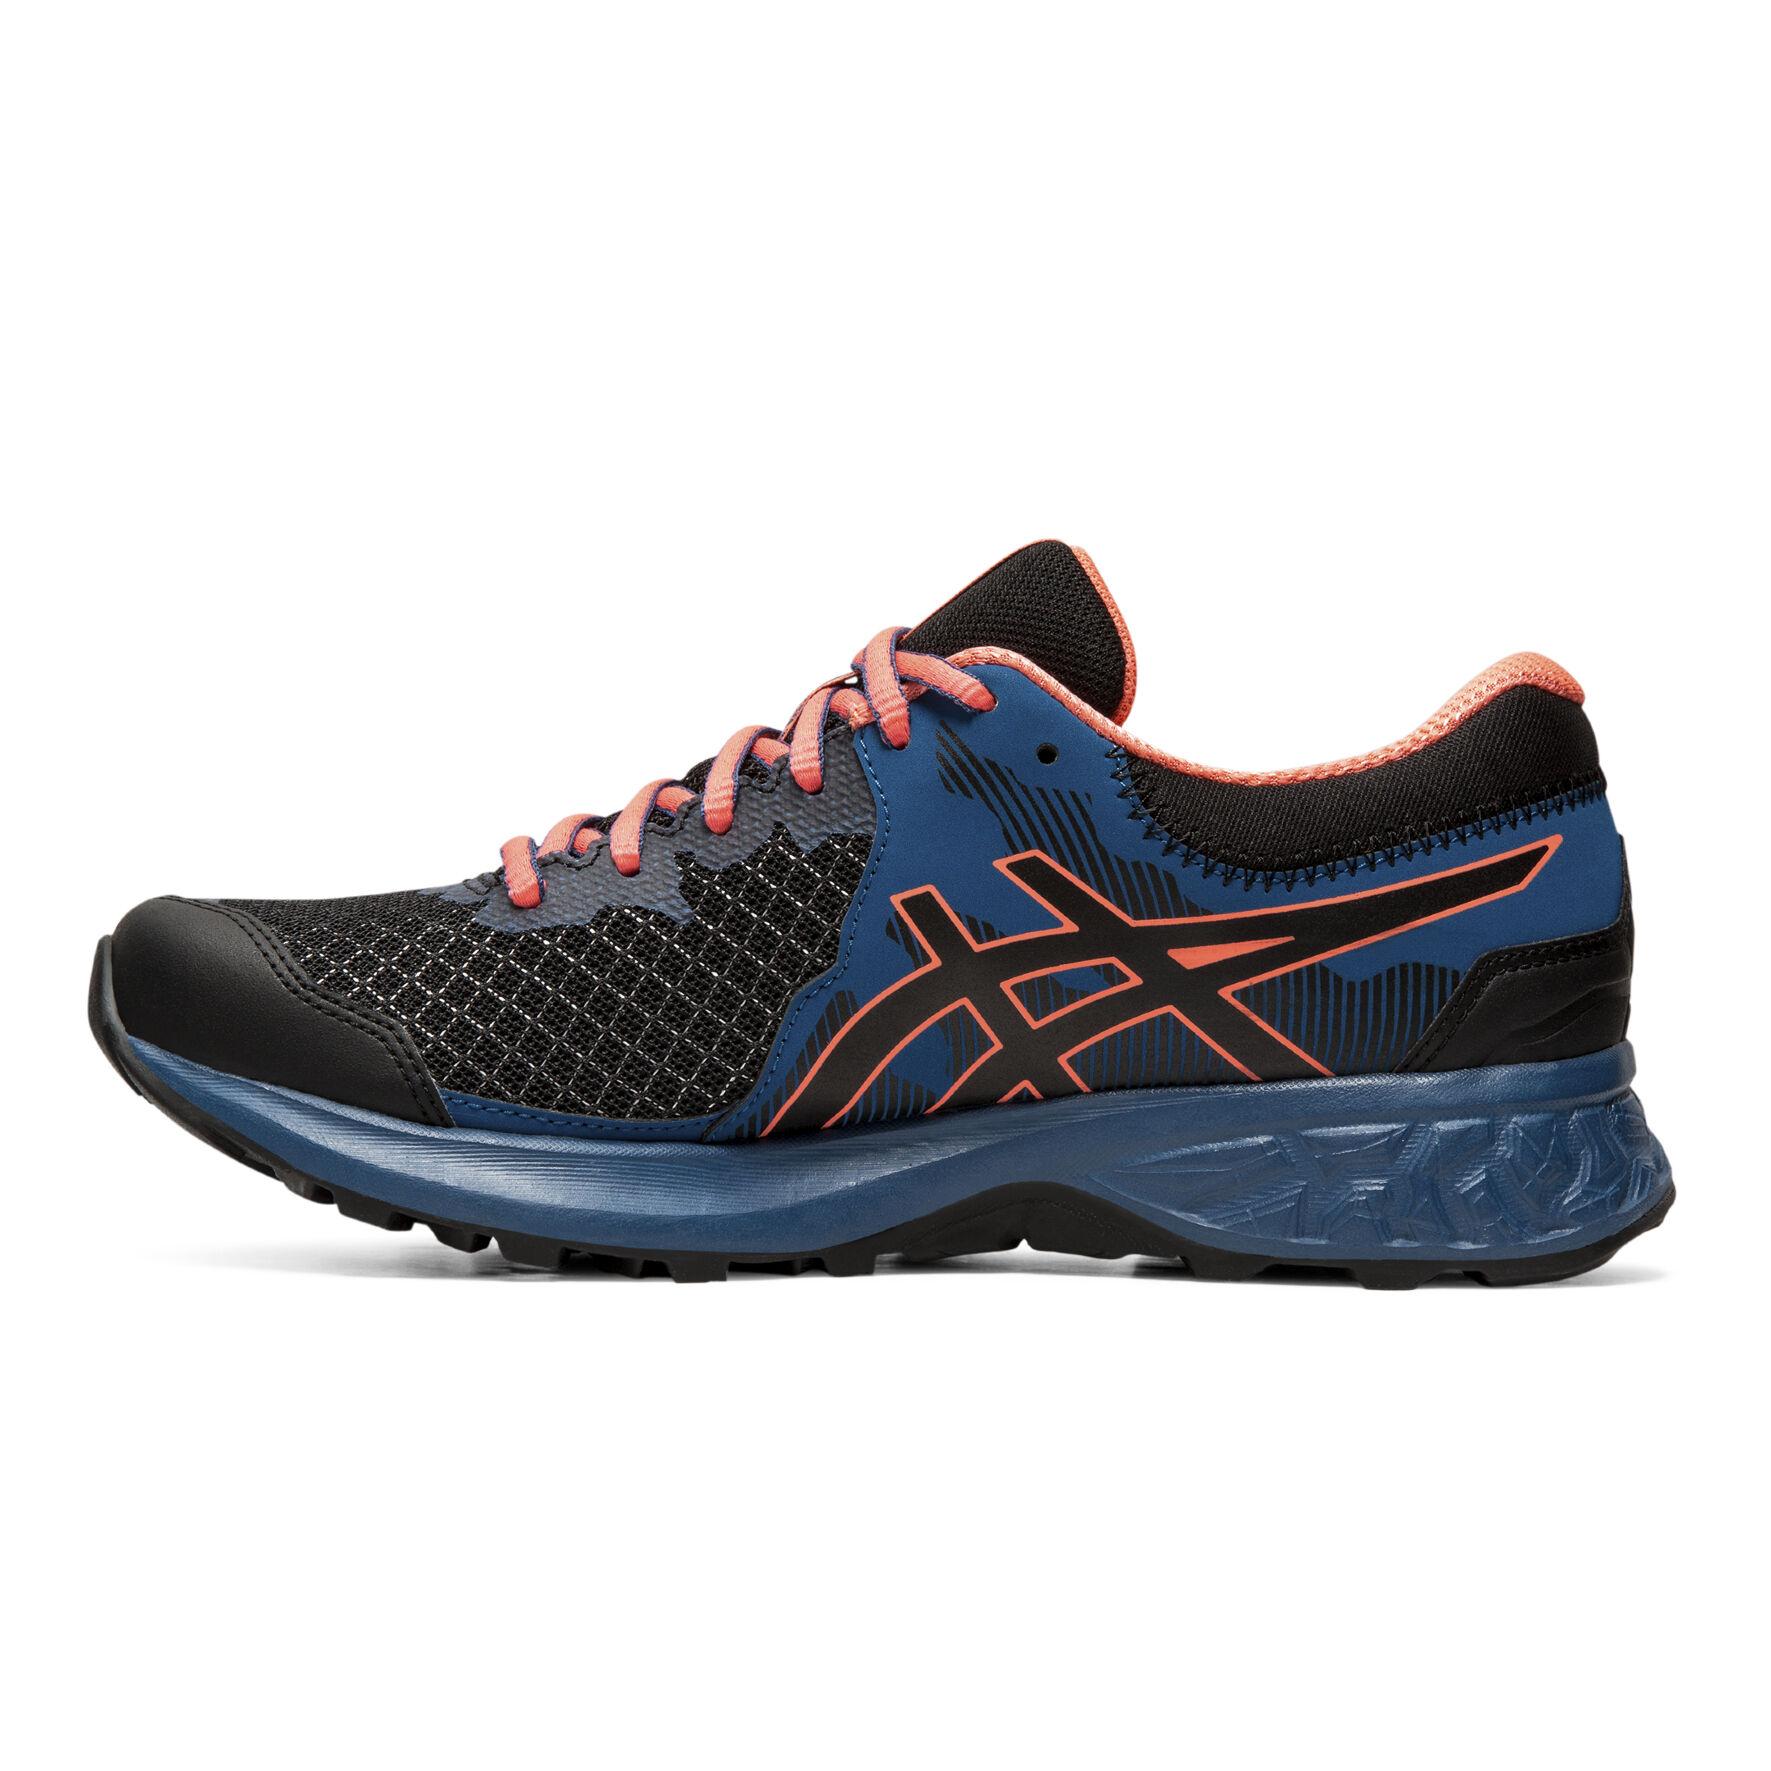 Asics Gel Sonoma 4 (D) Womens Trail Running Shoes BlackSun Coral